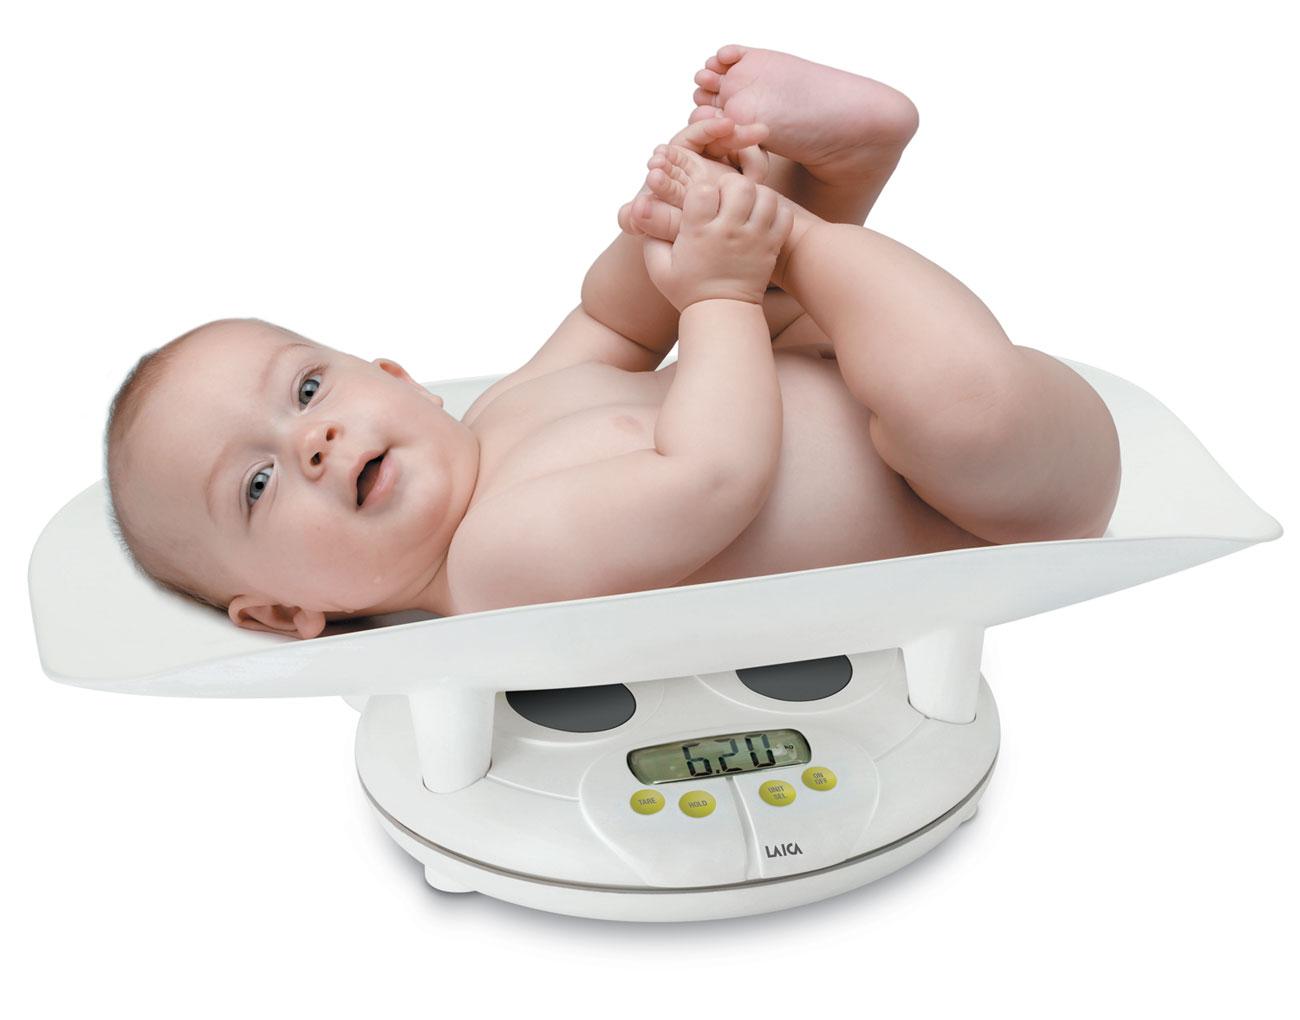 Cantar pentru bebelusi Laica PS3004 laicashop.ro 2021